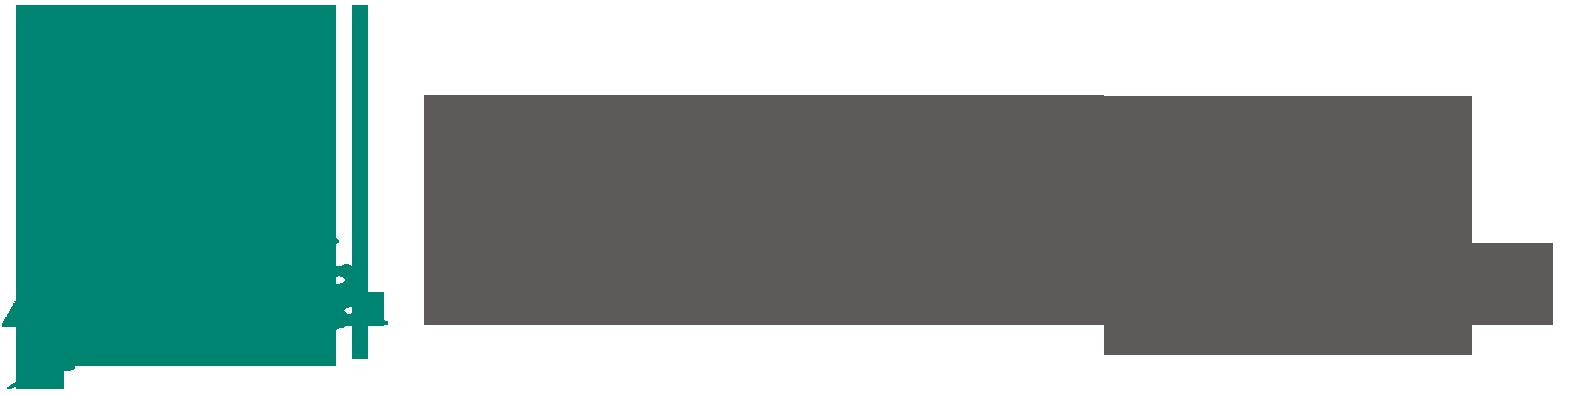 Logo consell comarcal baix llobregat